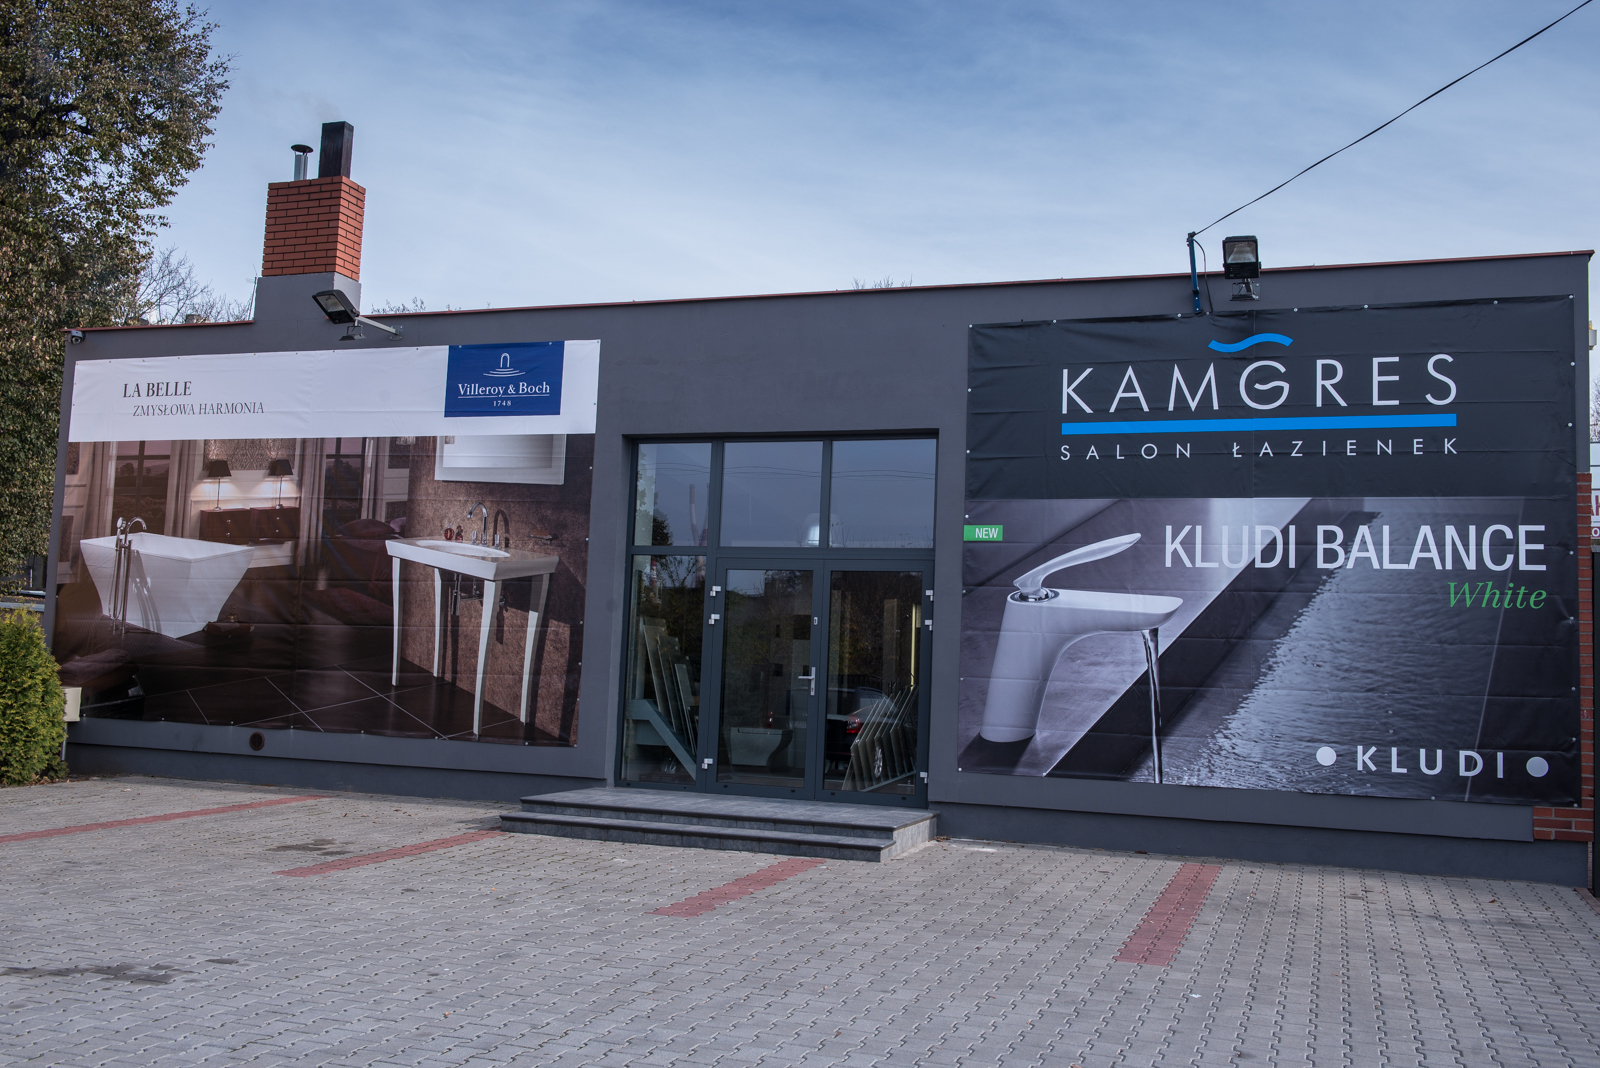 Salon Łazienek Kamgres   Łódź